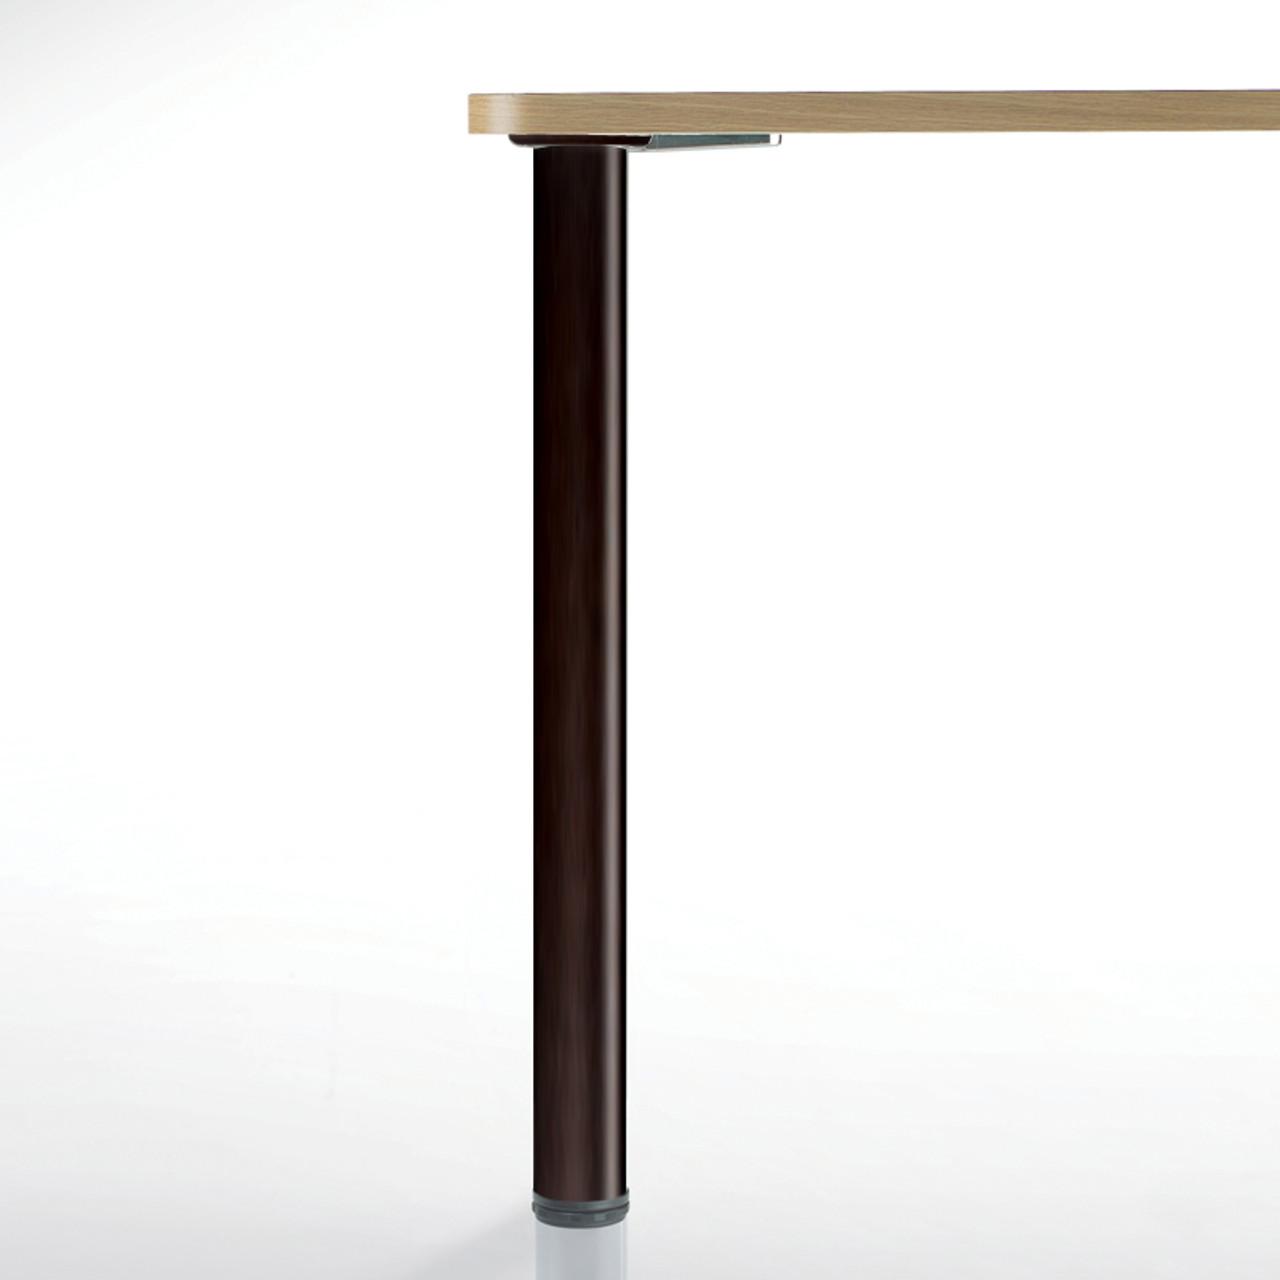 Hamburg Table Leg, Matte Black, 34-1/4'', 2-3/8'' diameter leg 1-1/8'' adjustable foot - replacementtablelegs.com